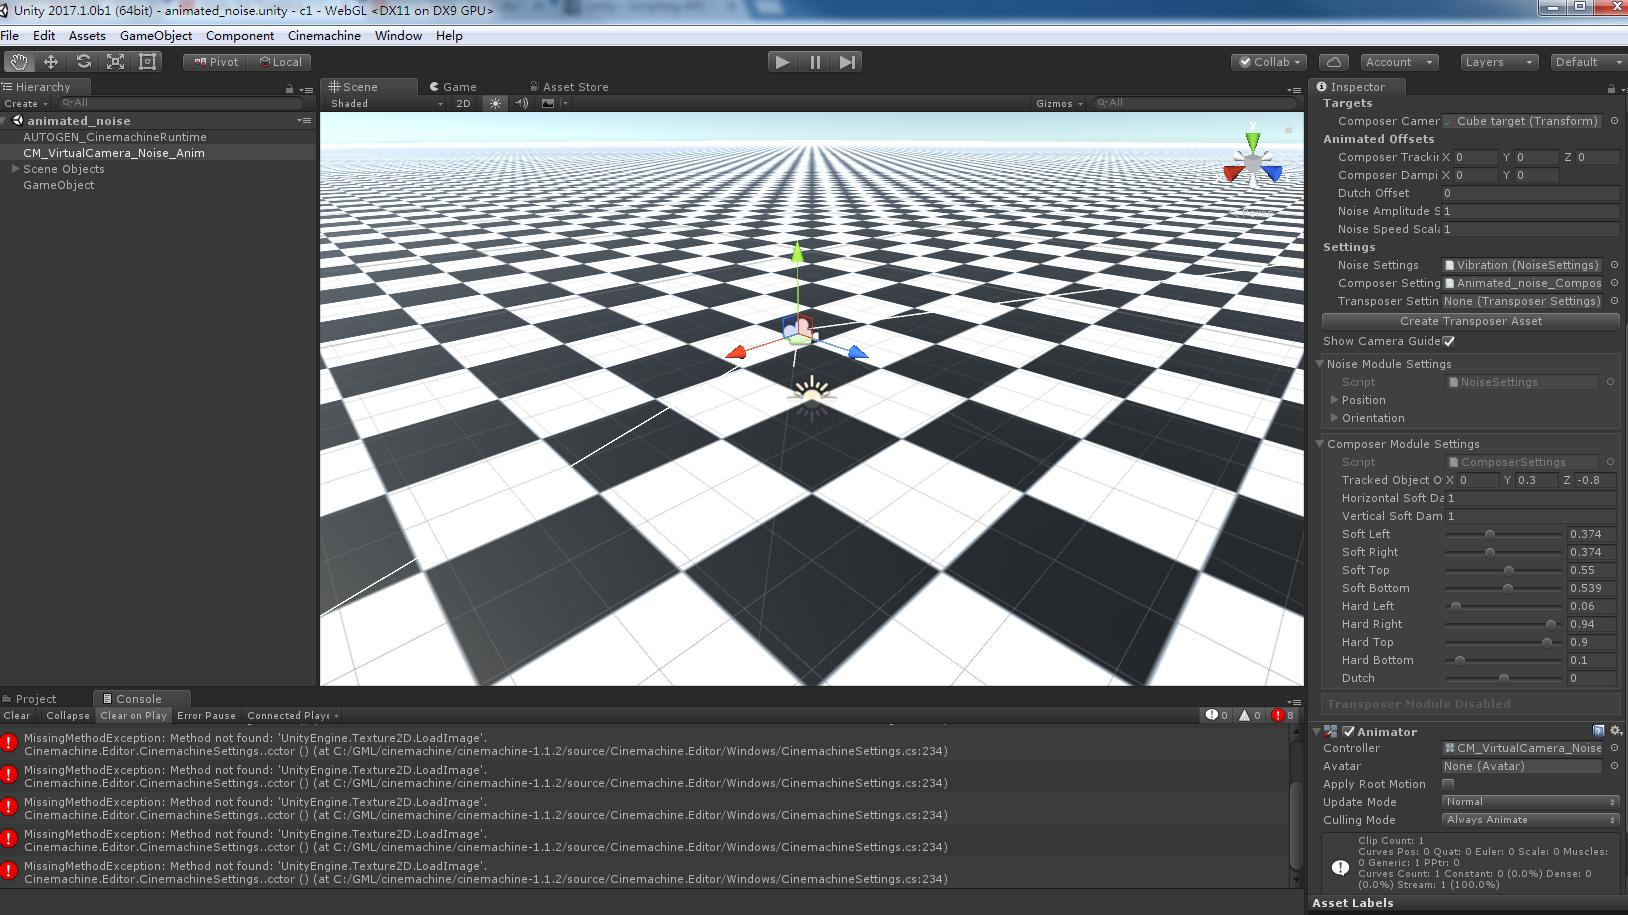 UnityEngine Texture2D LoadImage is missing - Unity Forum